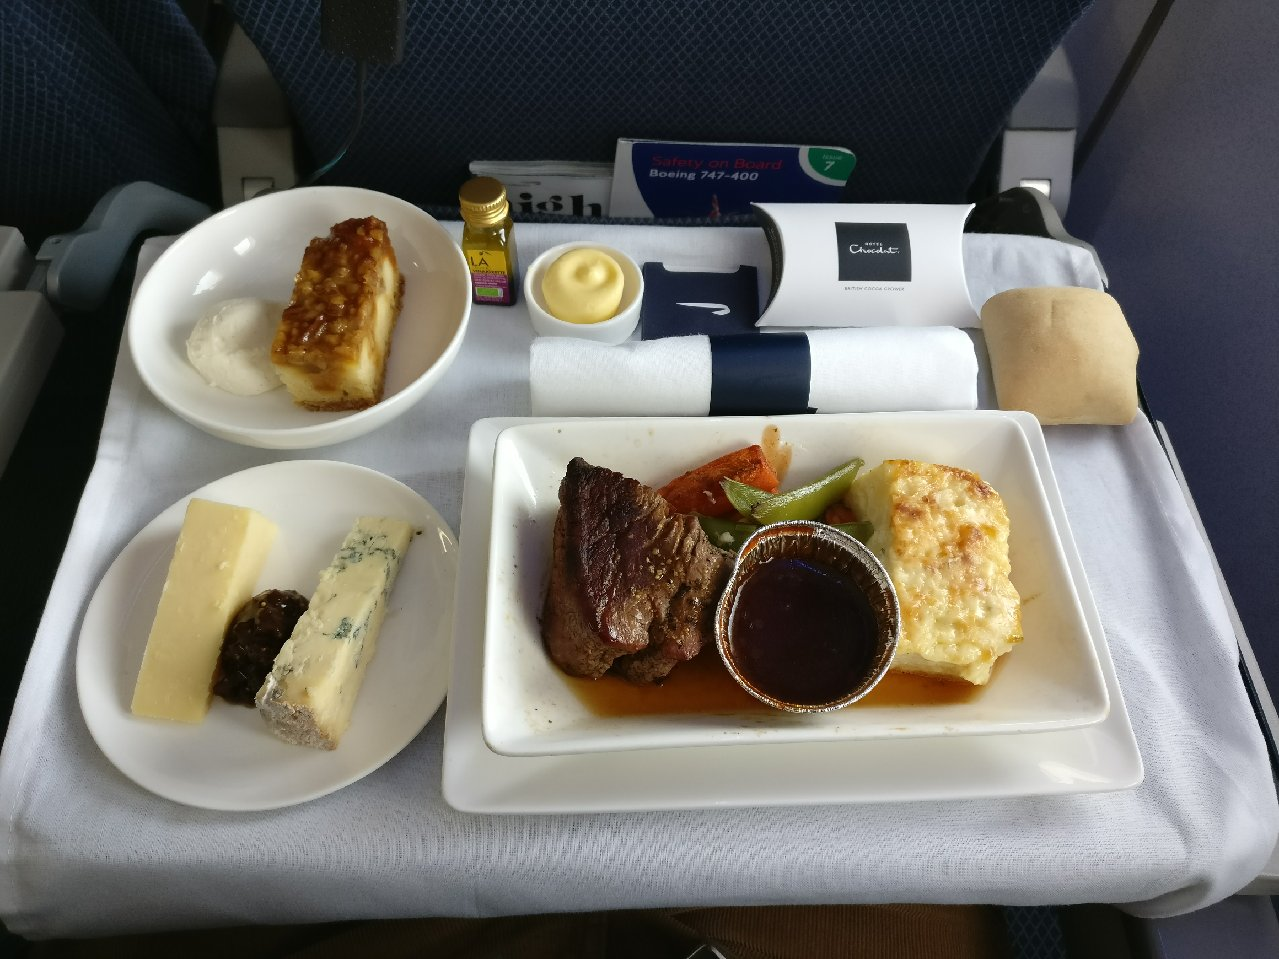 British Airways World Traveller Economy Class Review